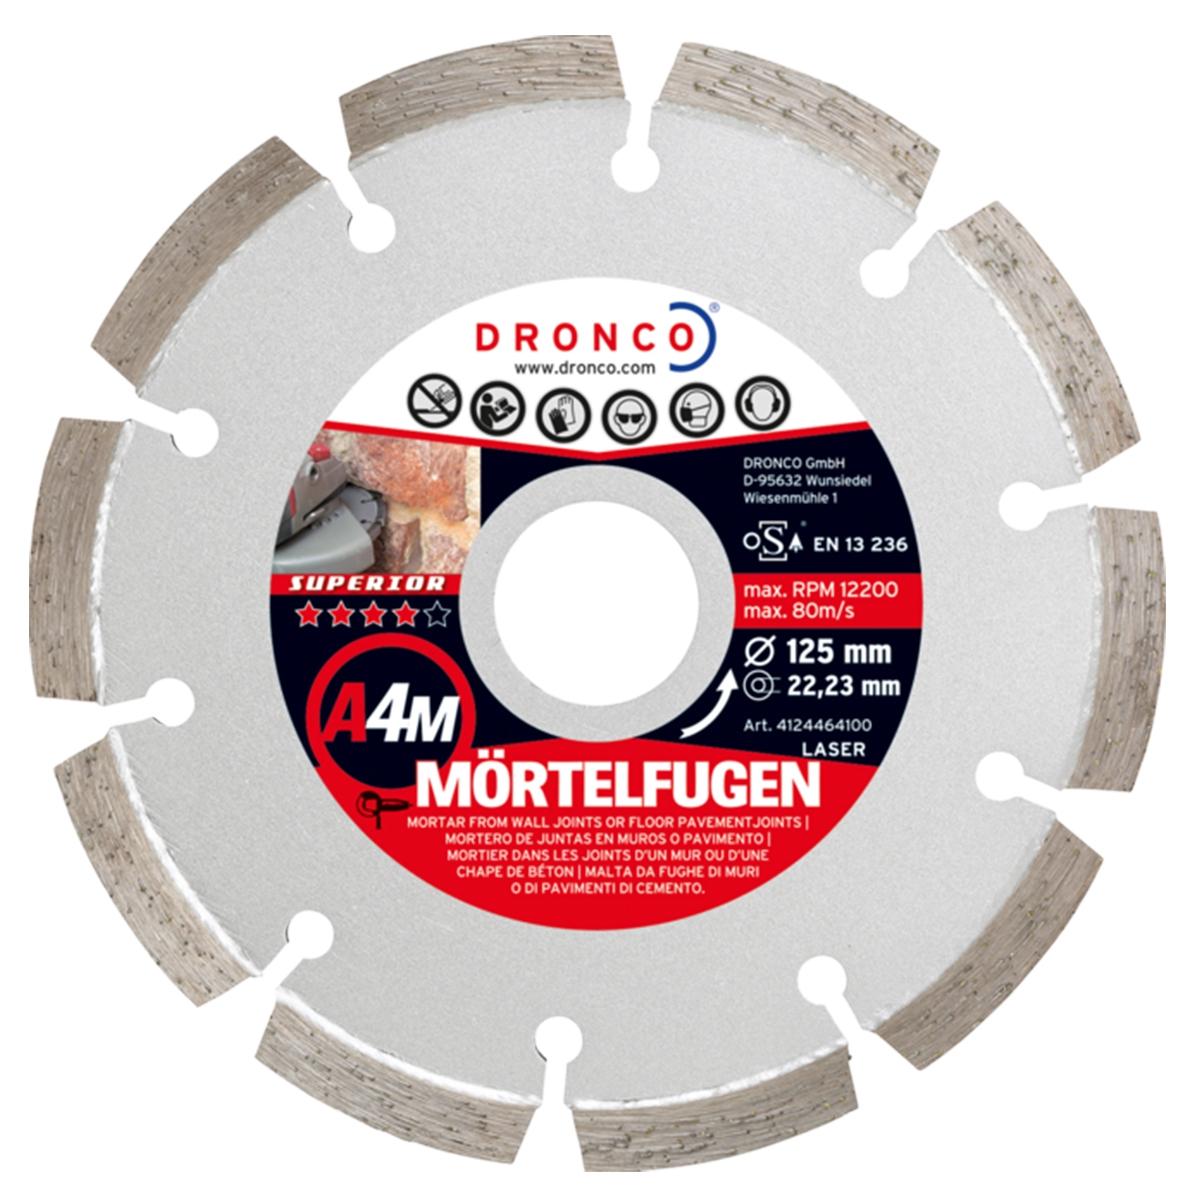 Mortar Raking Disc